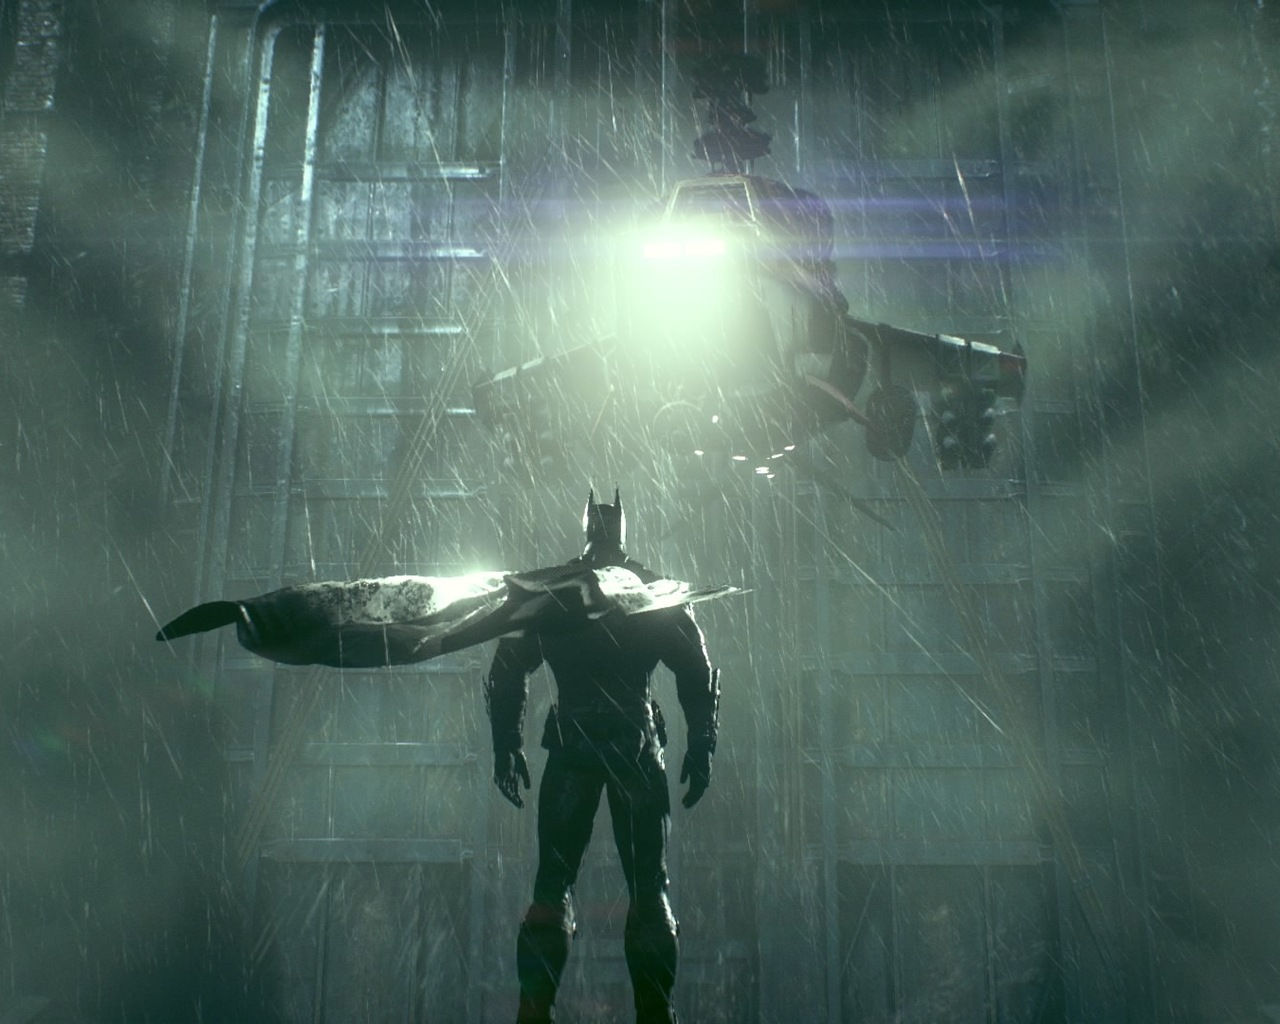 batman-arkham-knight-hd-zk.jpg